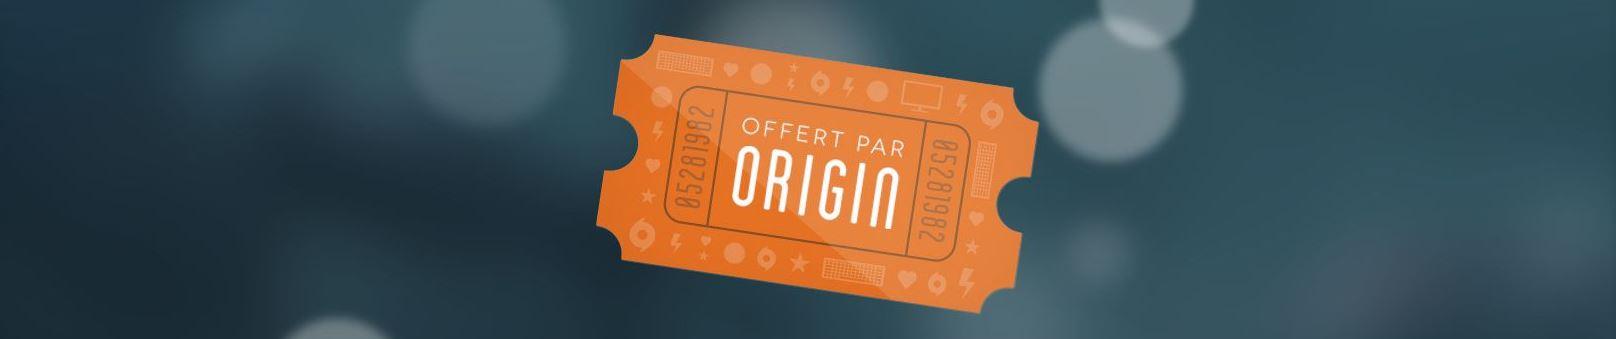 mass-effect-2-gratuit-sur-origin